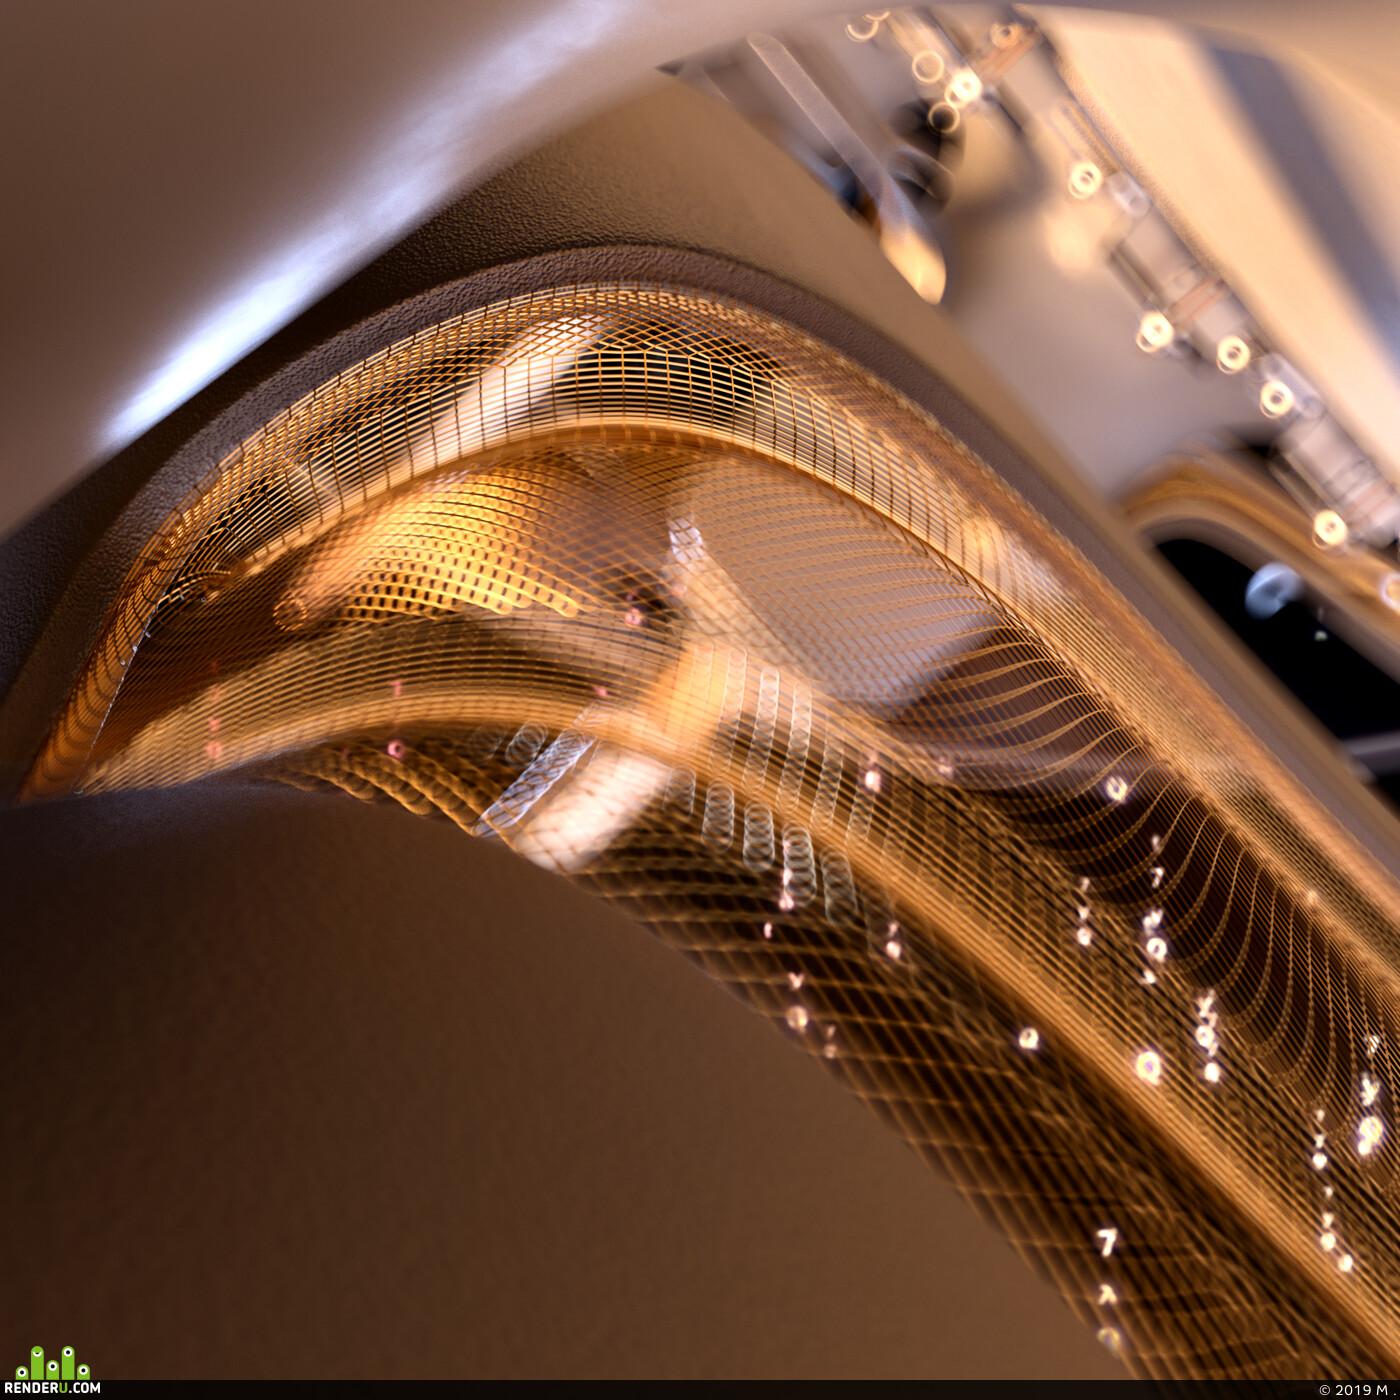 c4d, lighting, music, Science fiction